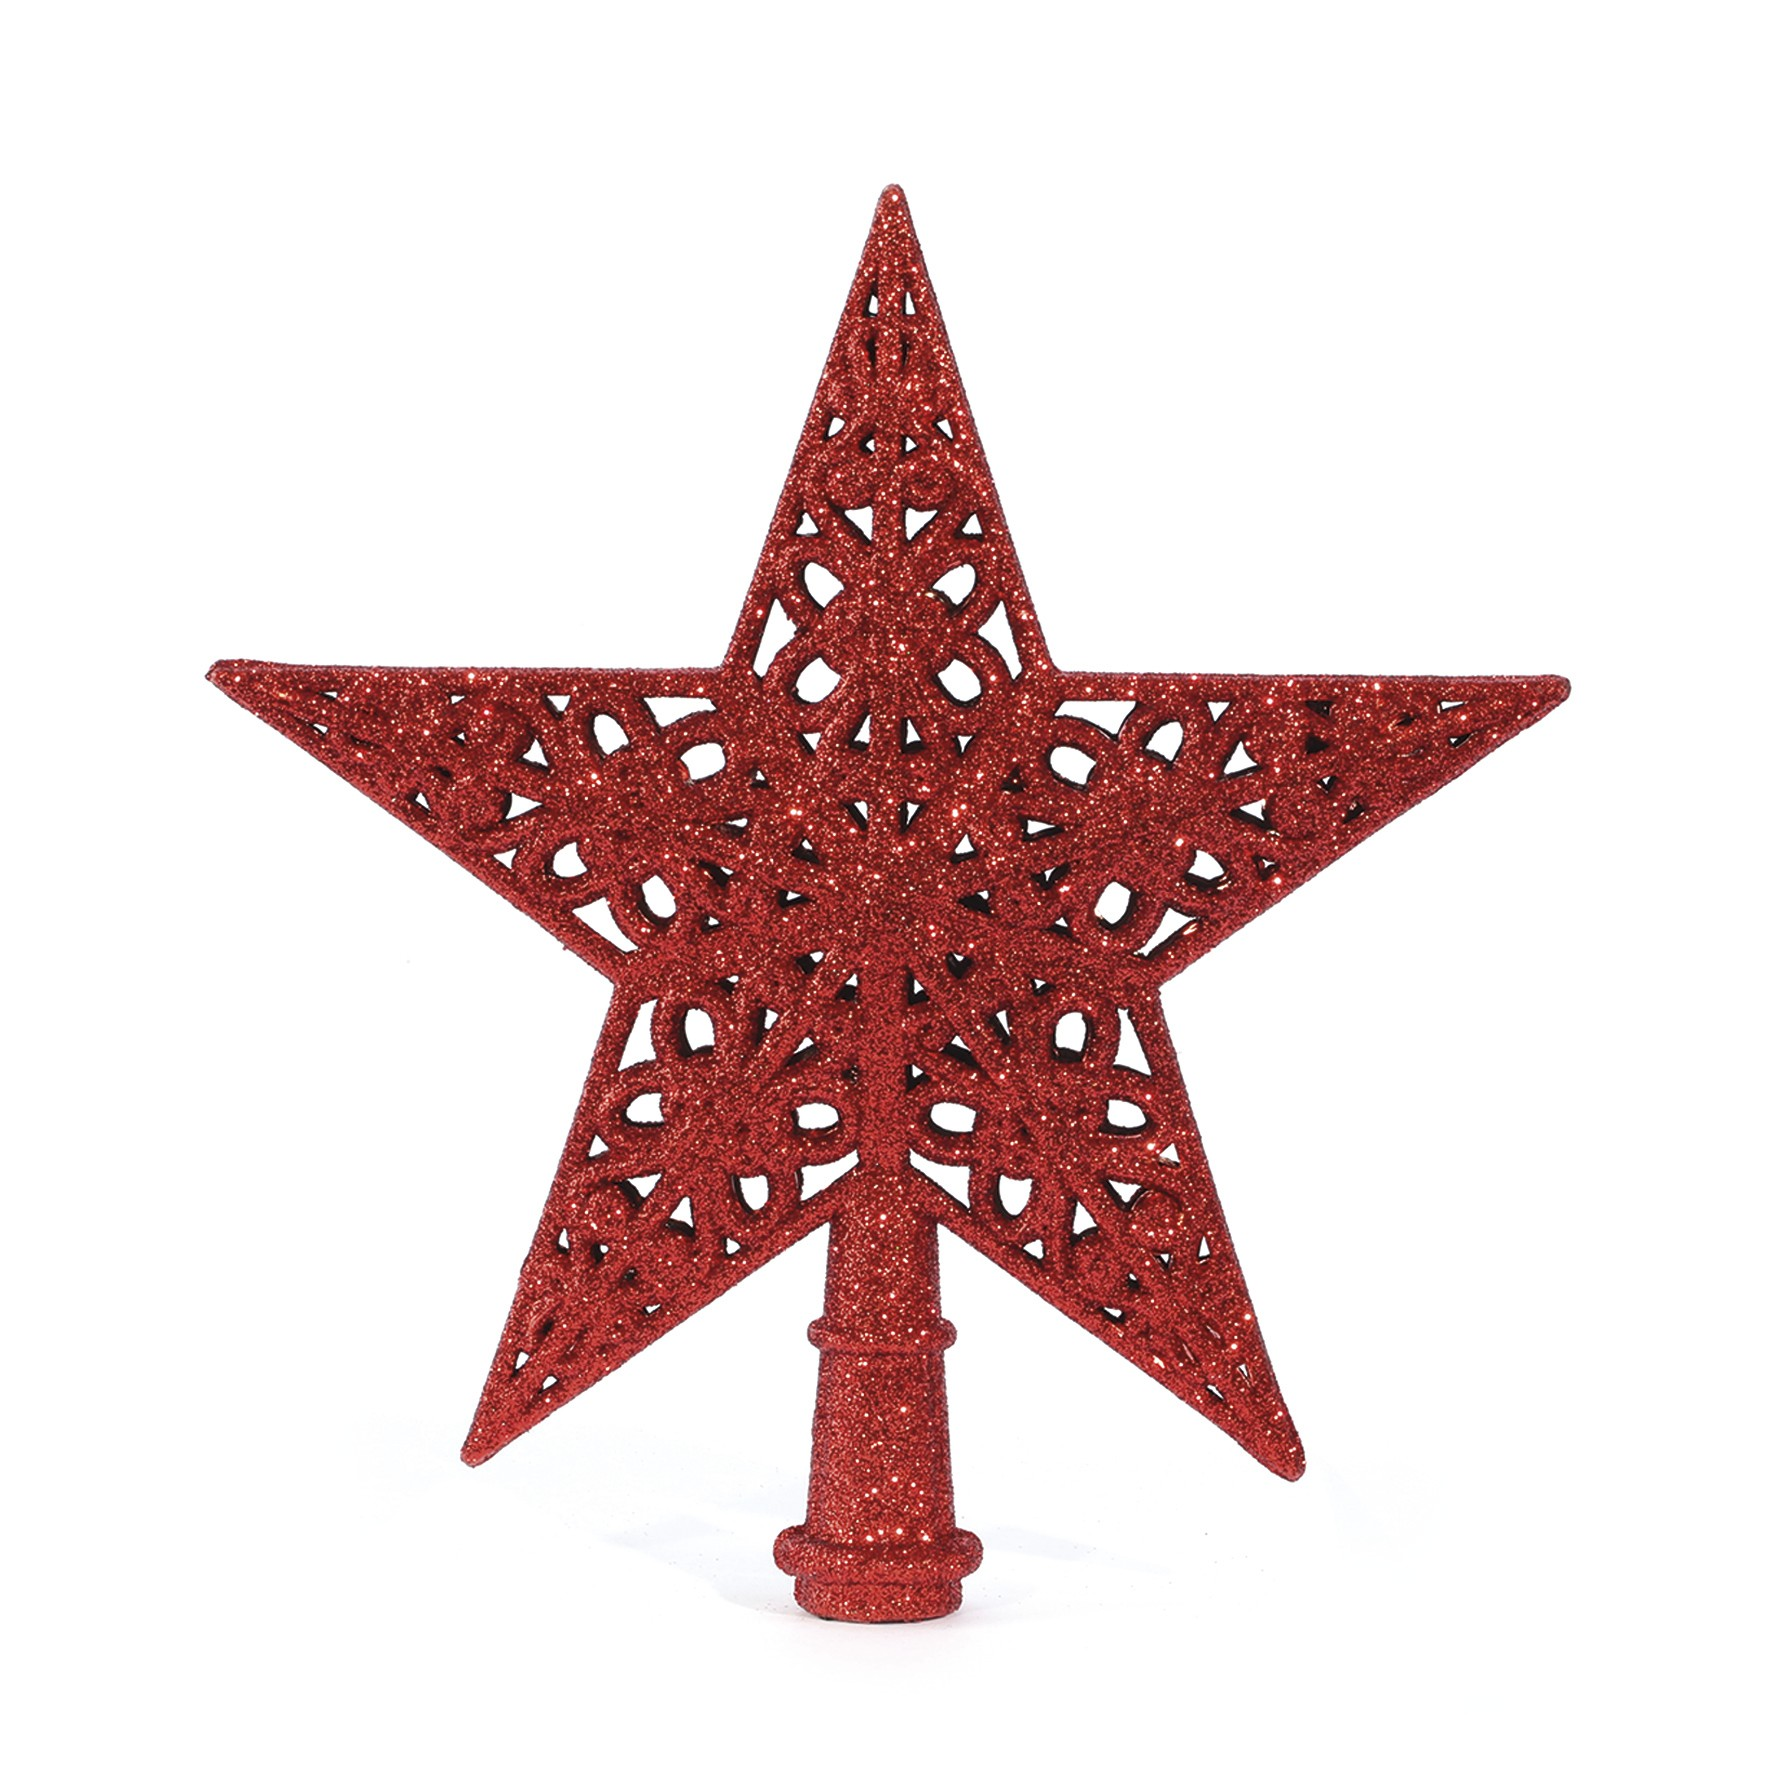 Estrela de Arvore de Natal 21 cm Vermelha - 19771 - Yangzi